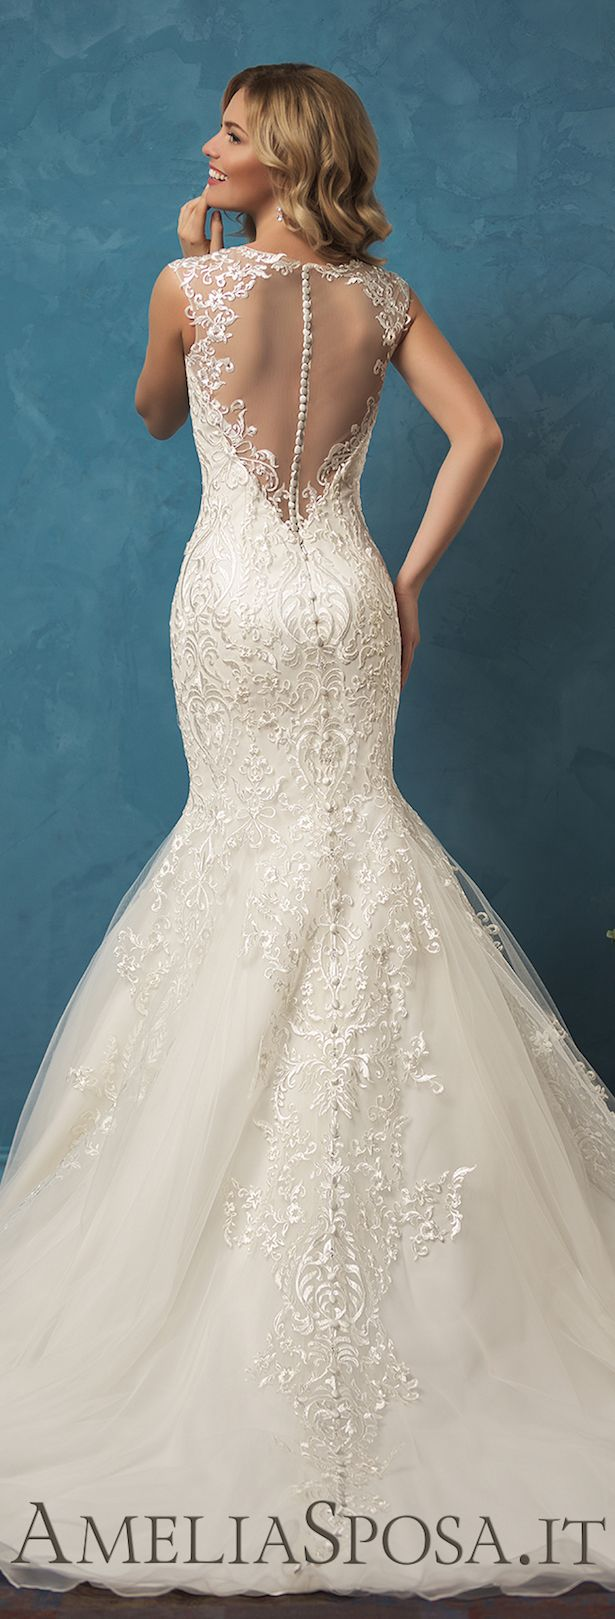 Amelia Sposa 2017 Wedding Dress   Belle the Magazine . The Wedding Blog For The Sophisticated Bride   Bloglovin'